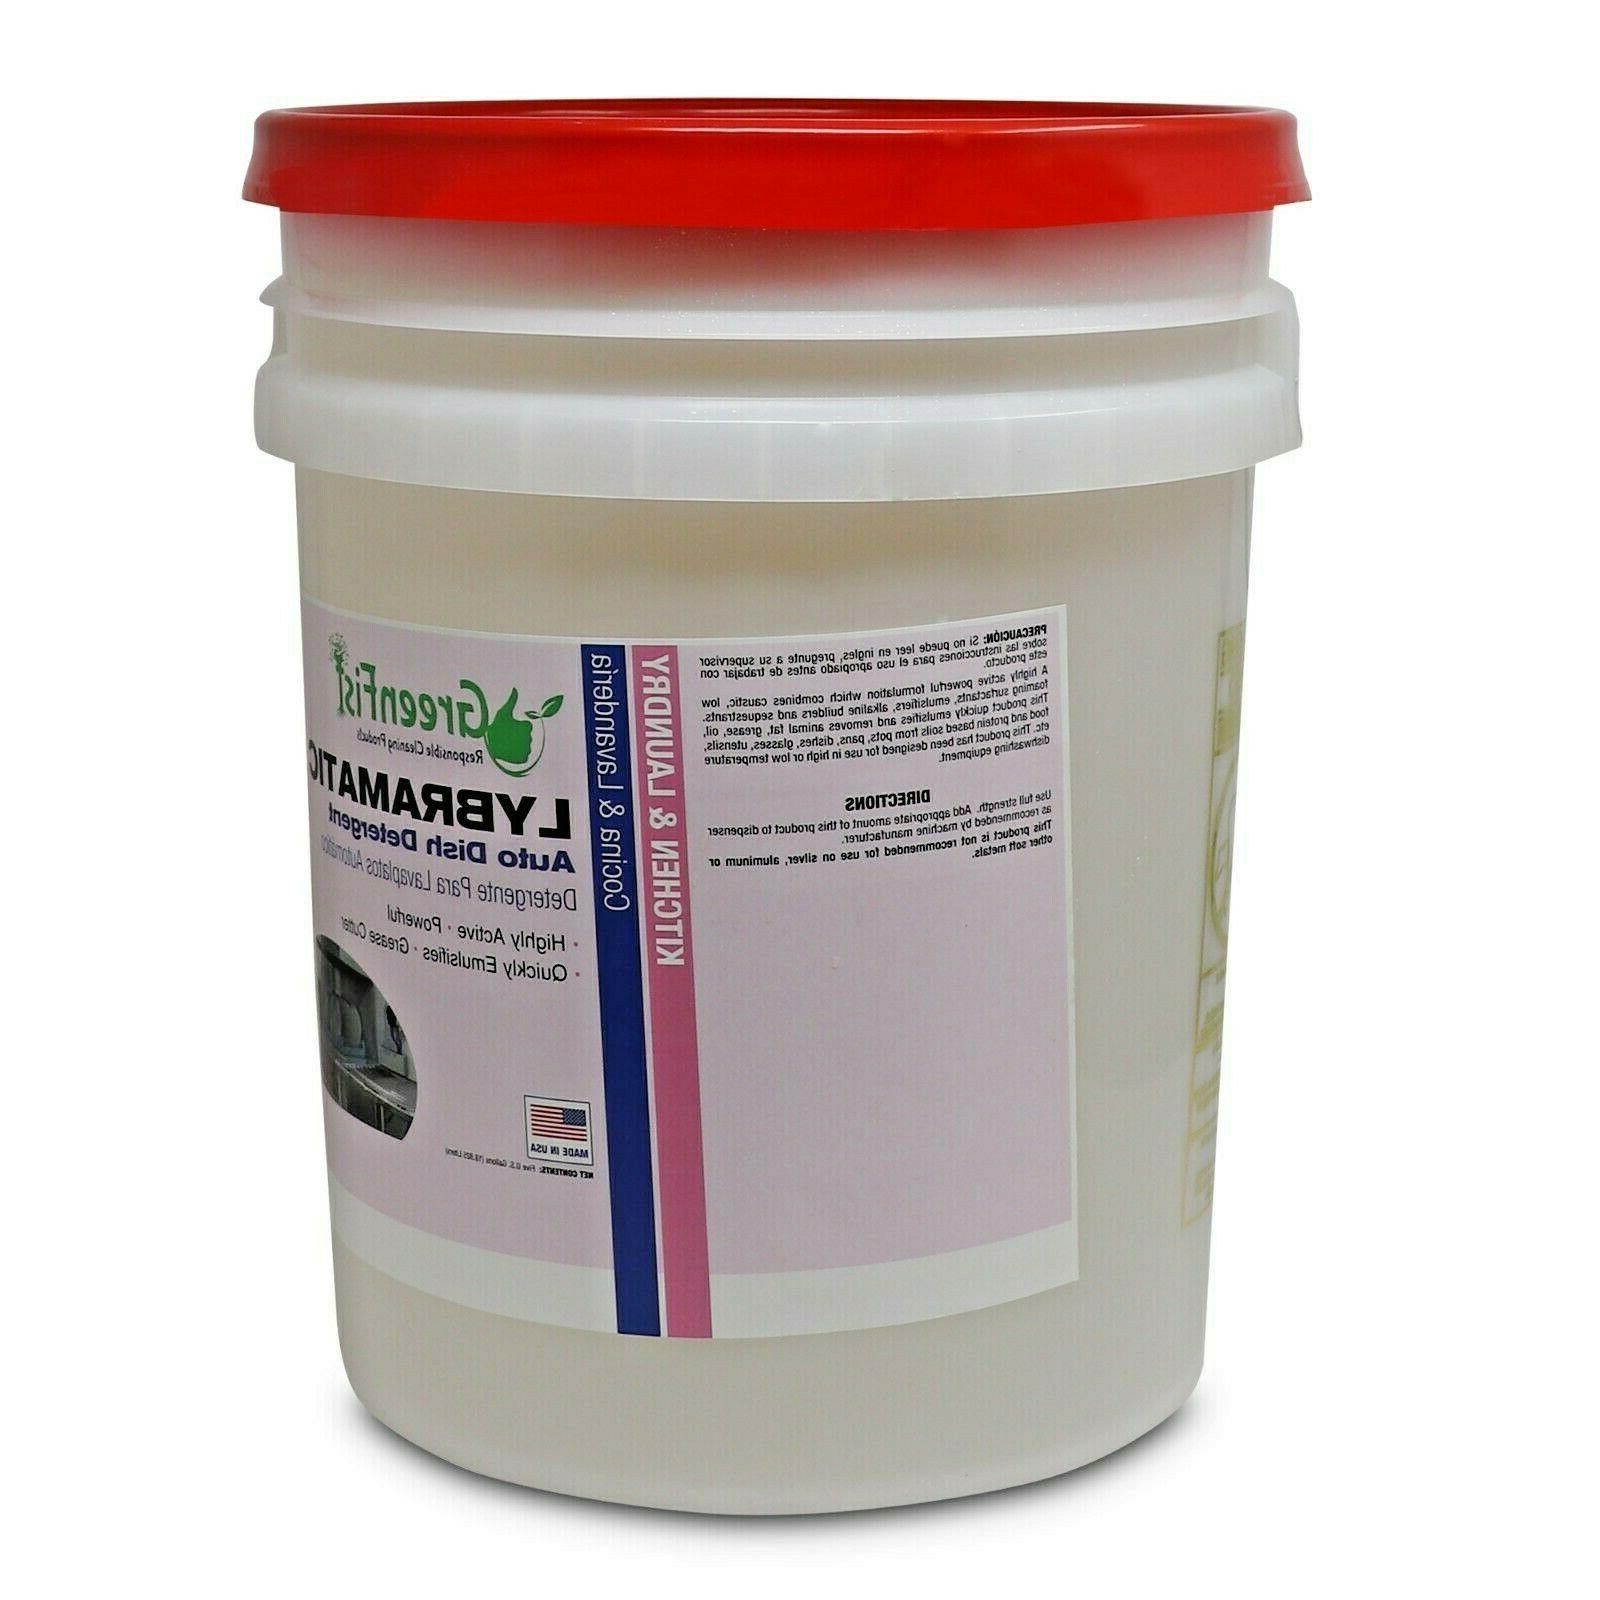 GreenFist Lybramatic Dishwasher Detergent